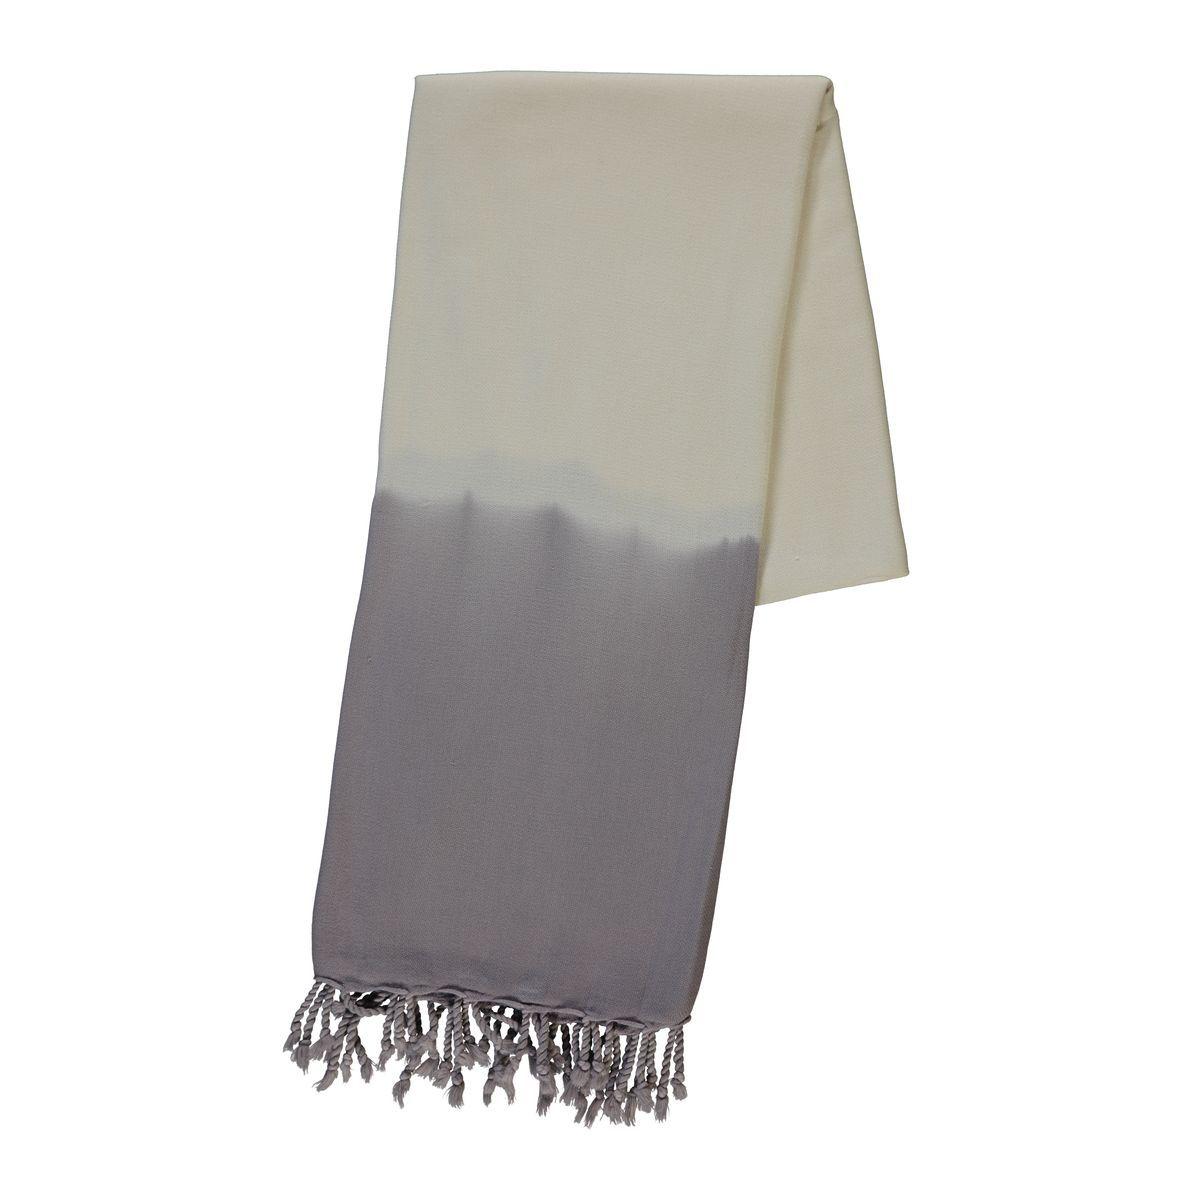 Peshtemal - Tie-Dye / Light Grey